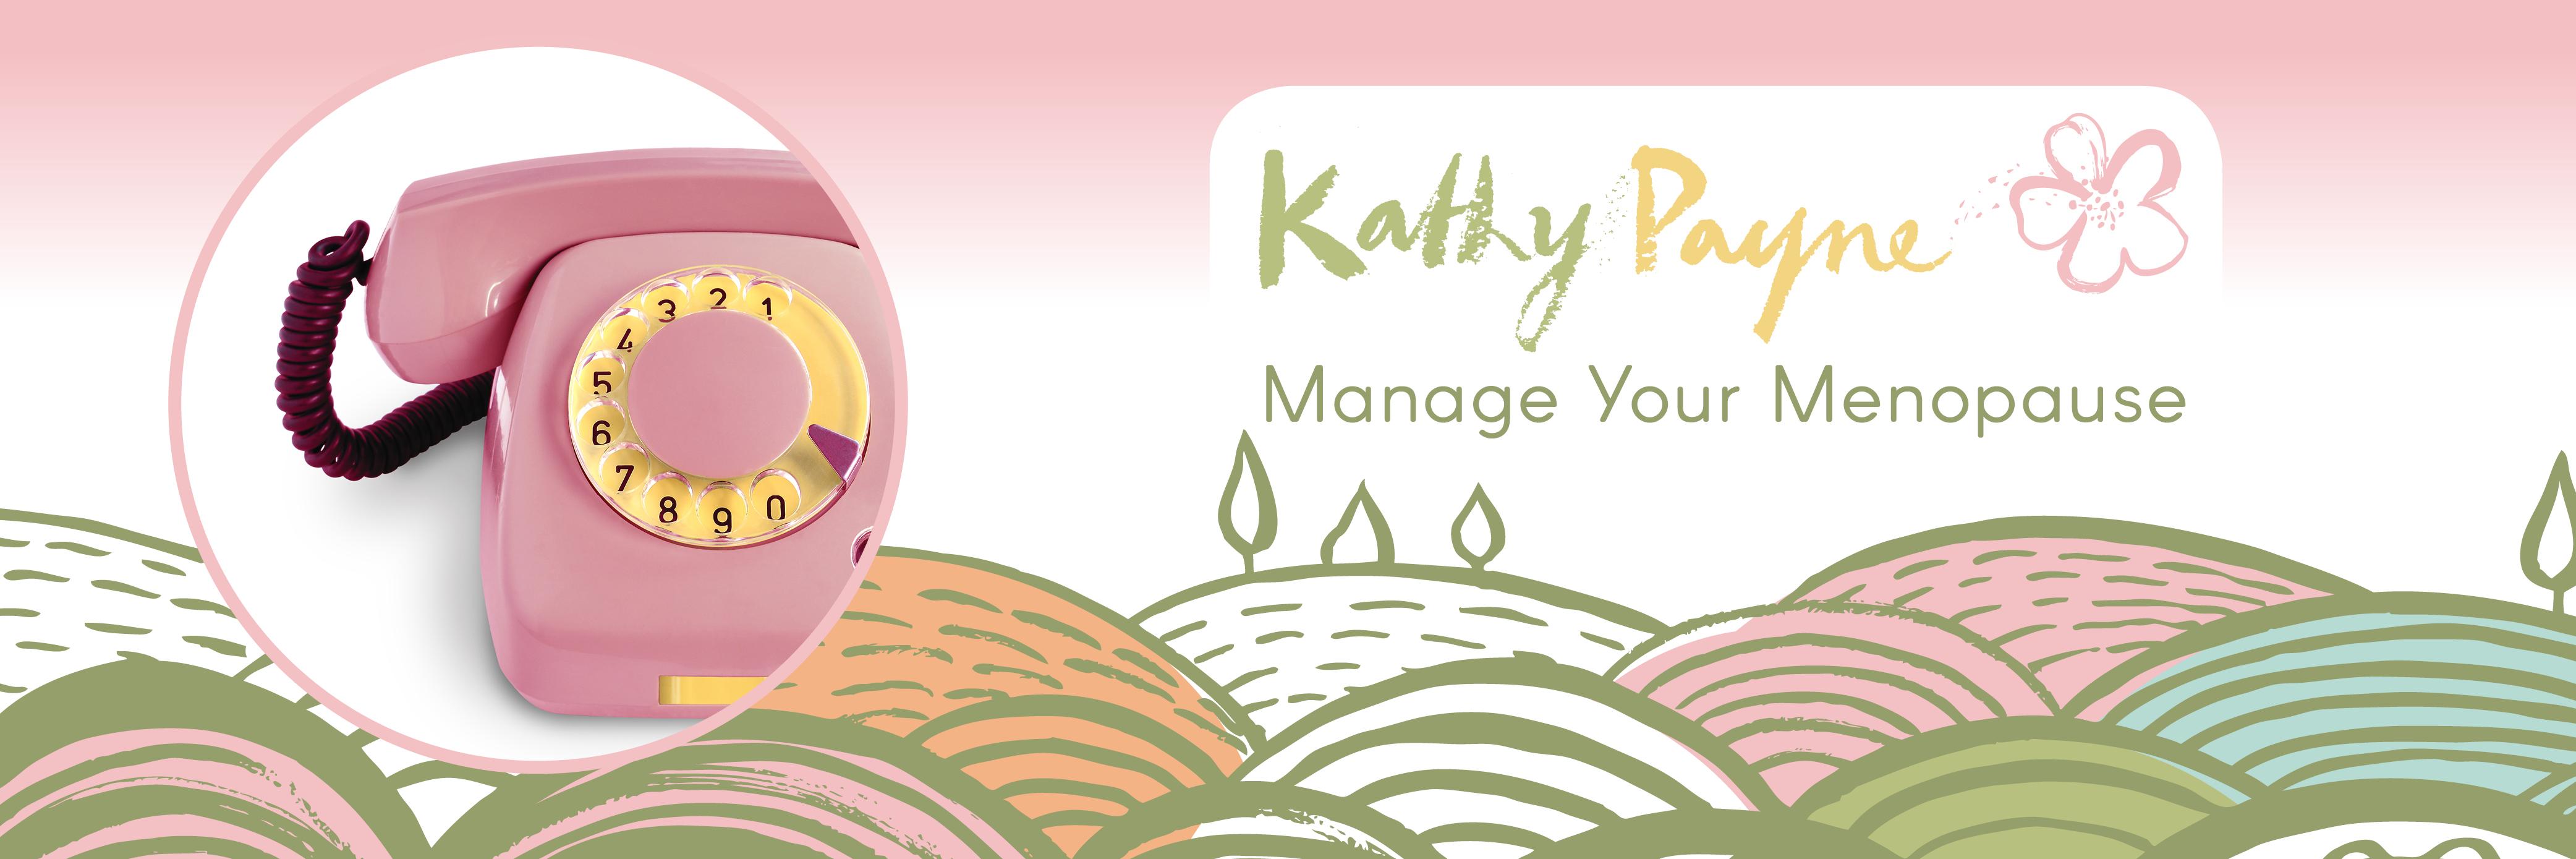 Menopause Free Resources Kathy Payne